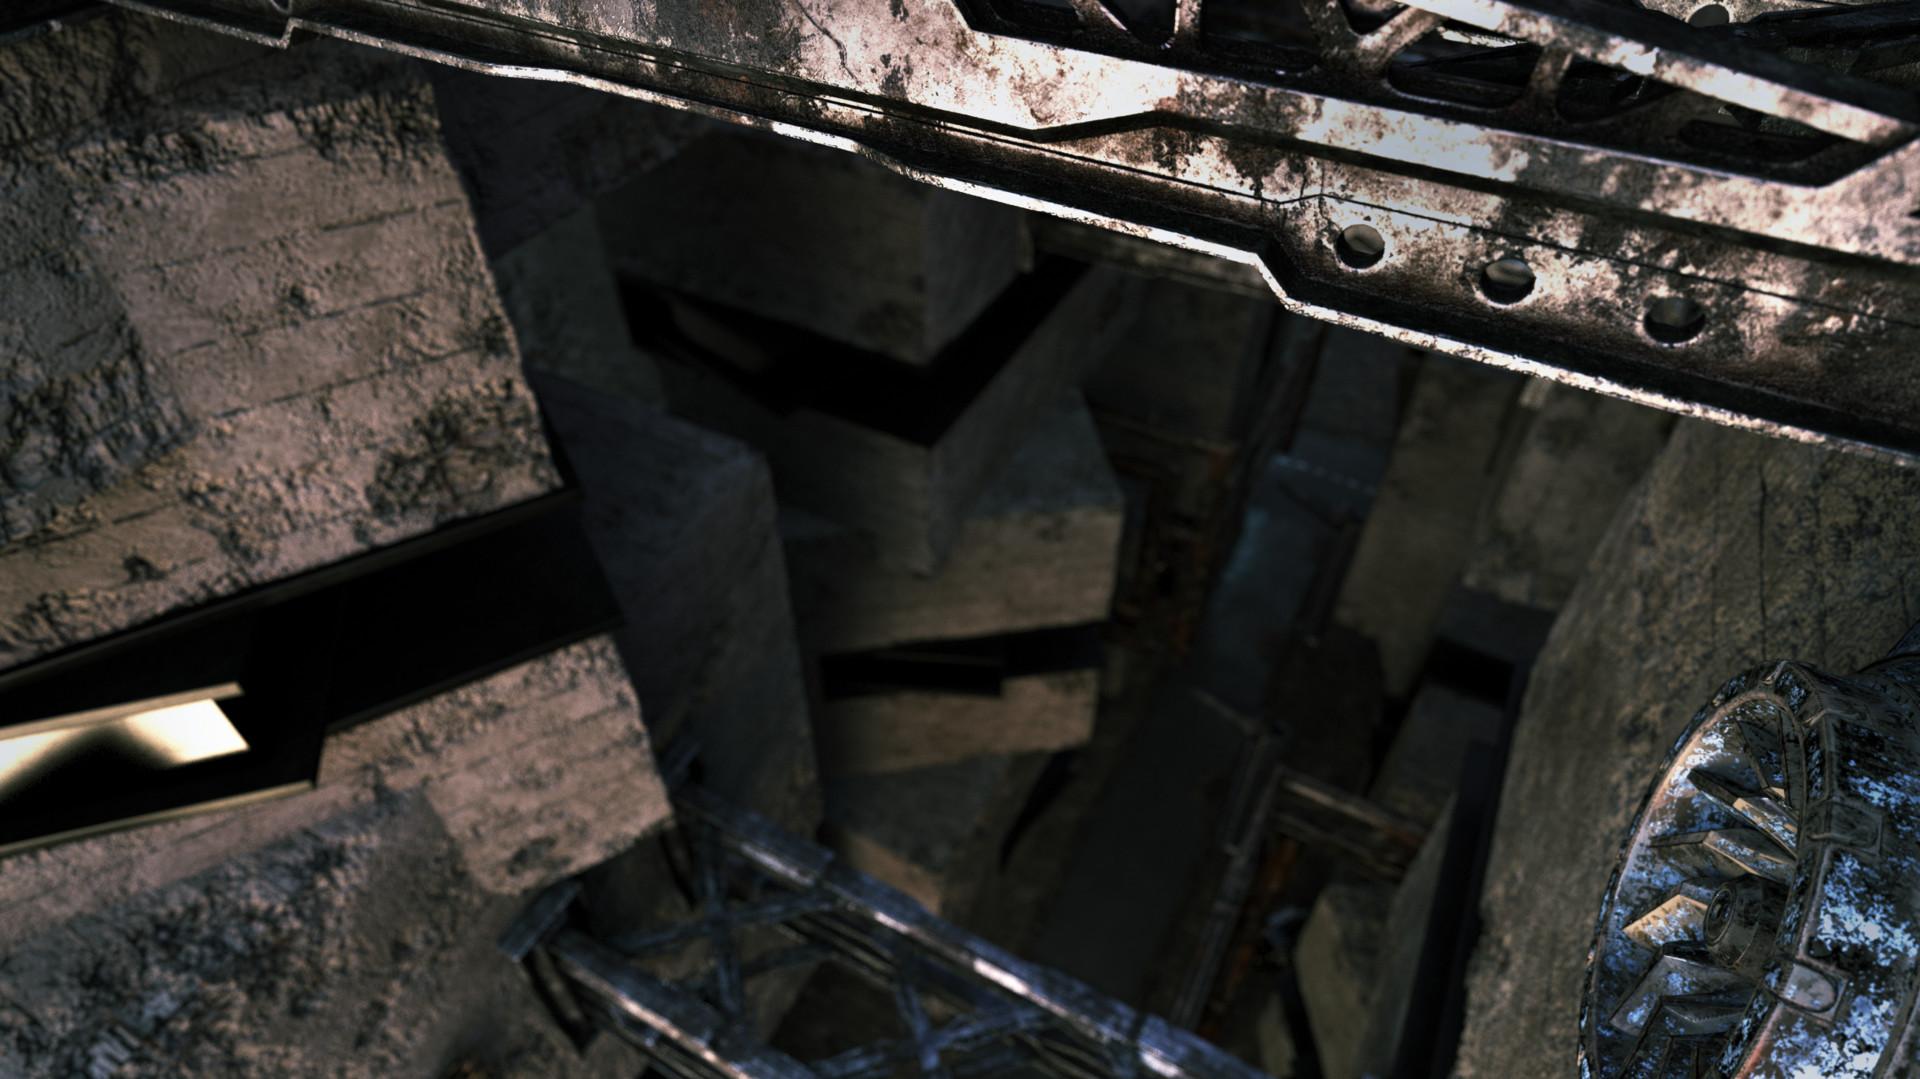 Tumen altangadas secret place v11 seq render variance 0003